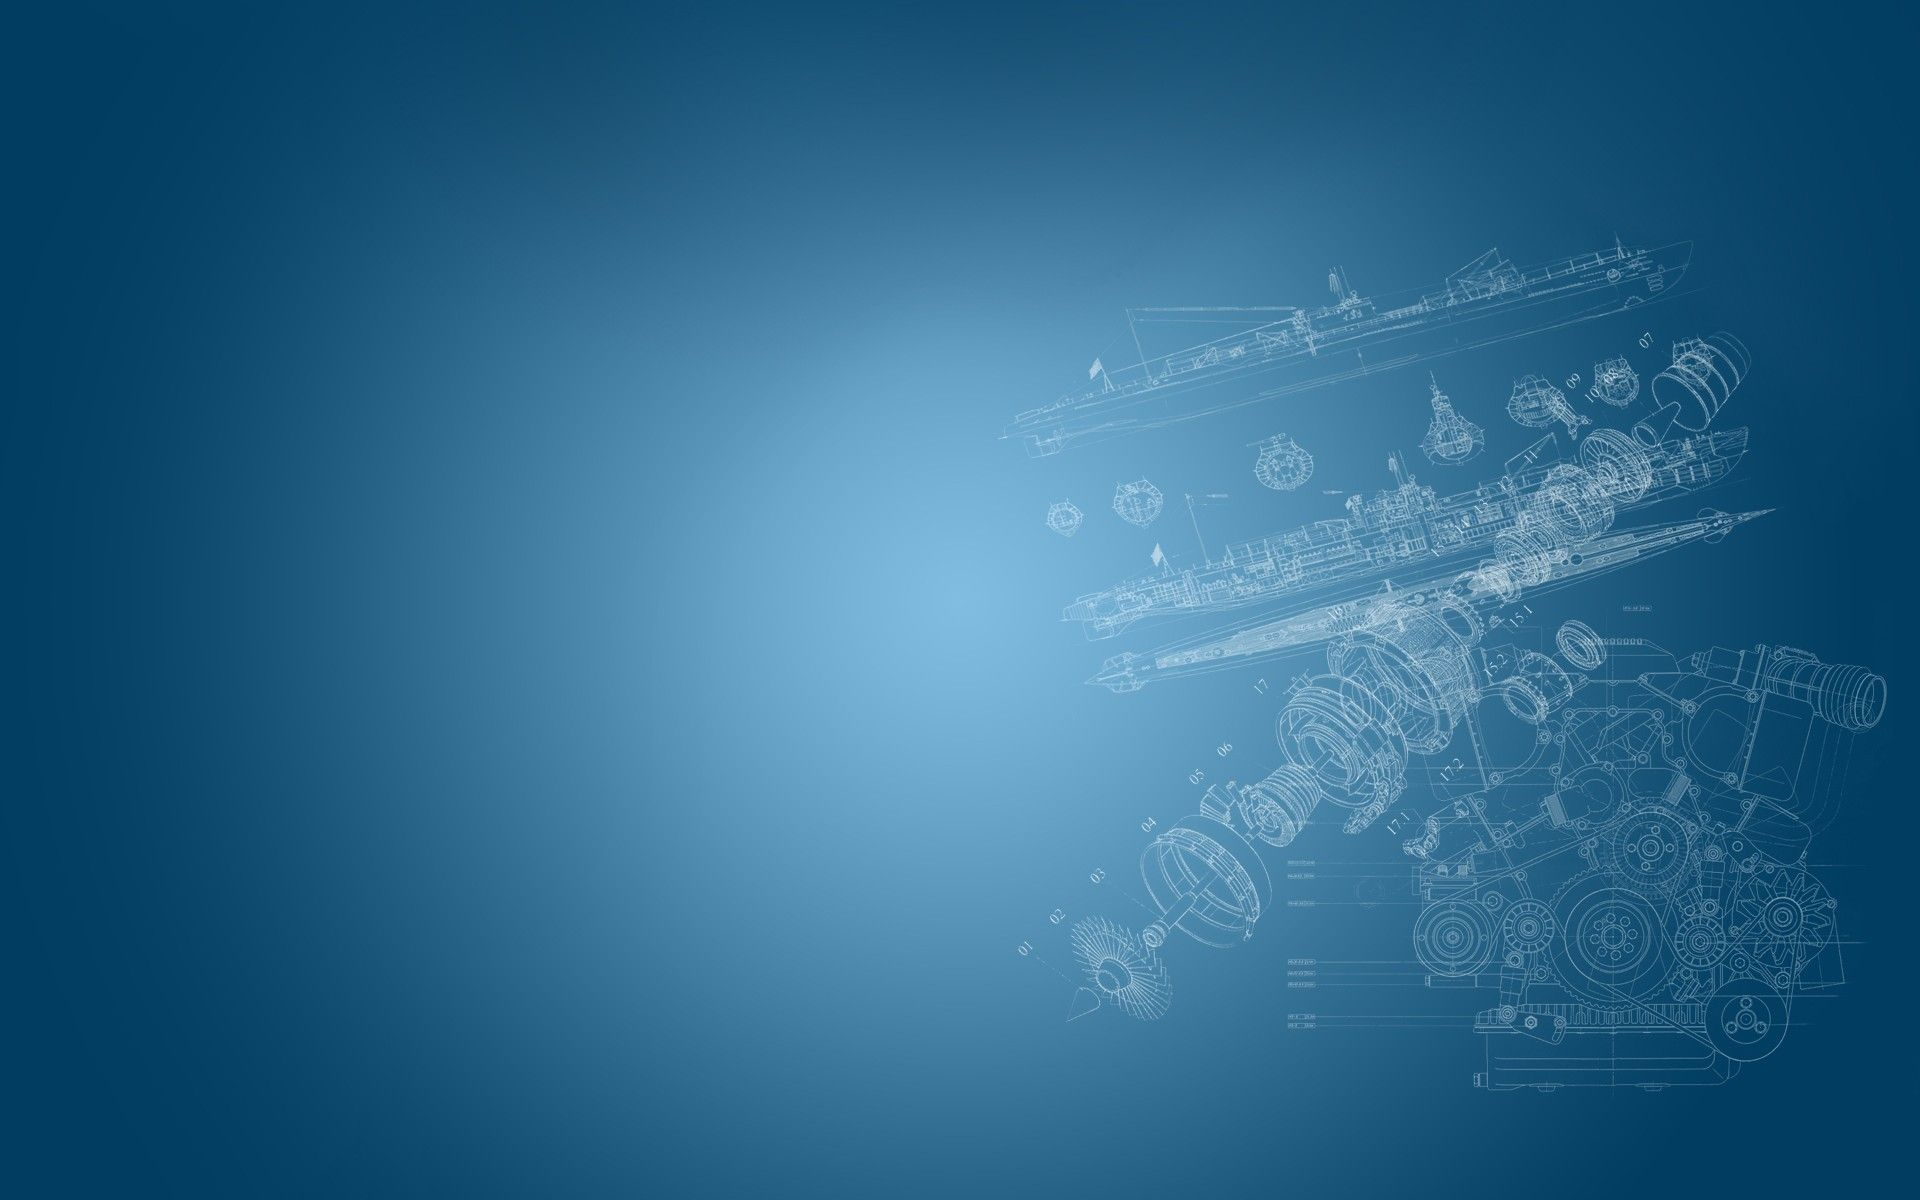 1920x1200 Civil Engineering S Wallpaper 1366x768 1555 Simple Backgrounds Mechanical Engineering Wallpaper Pc